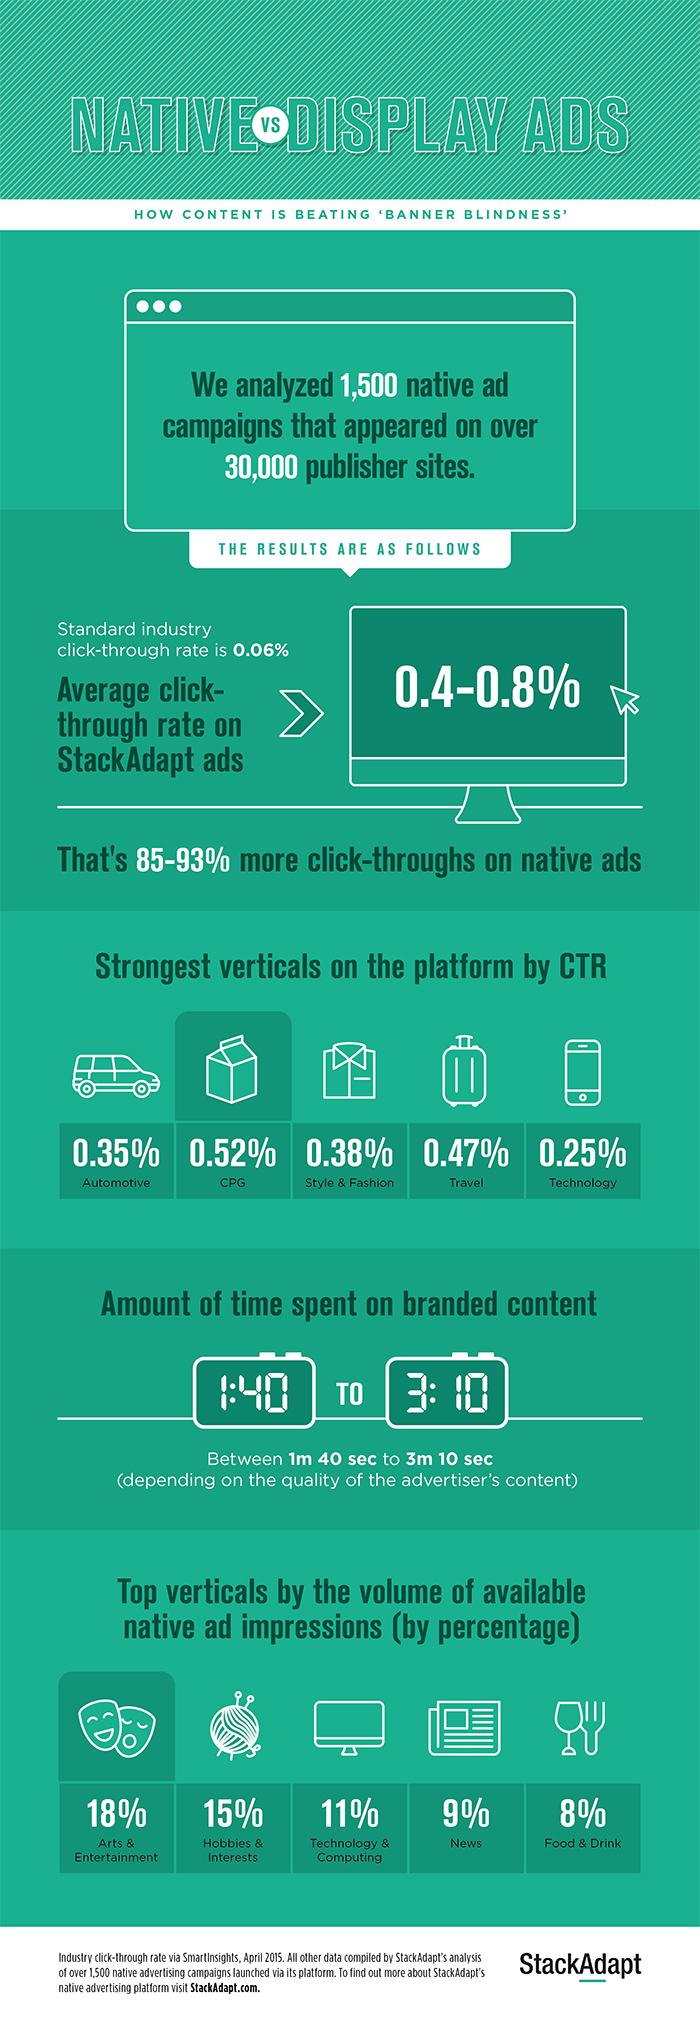 StackAdapt Infographic